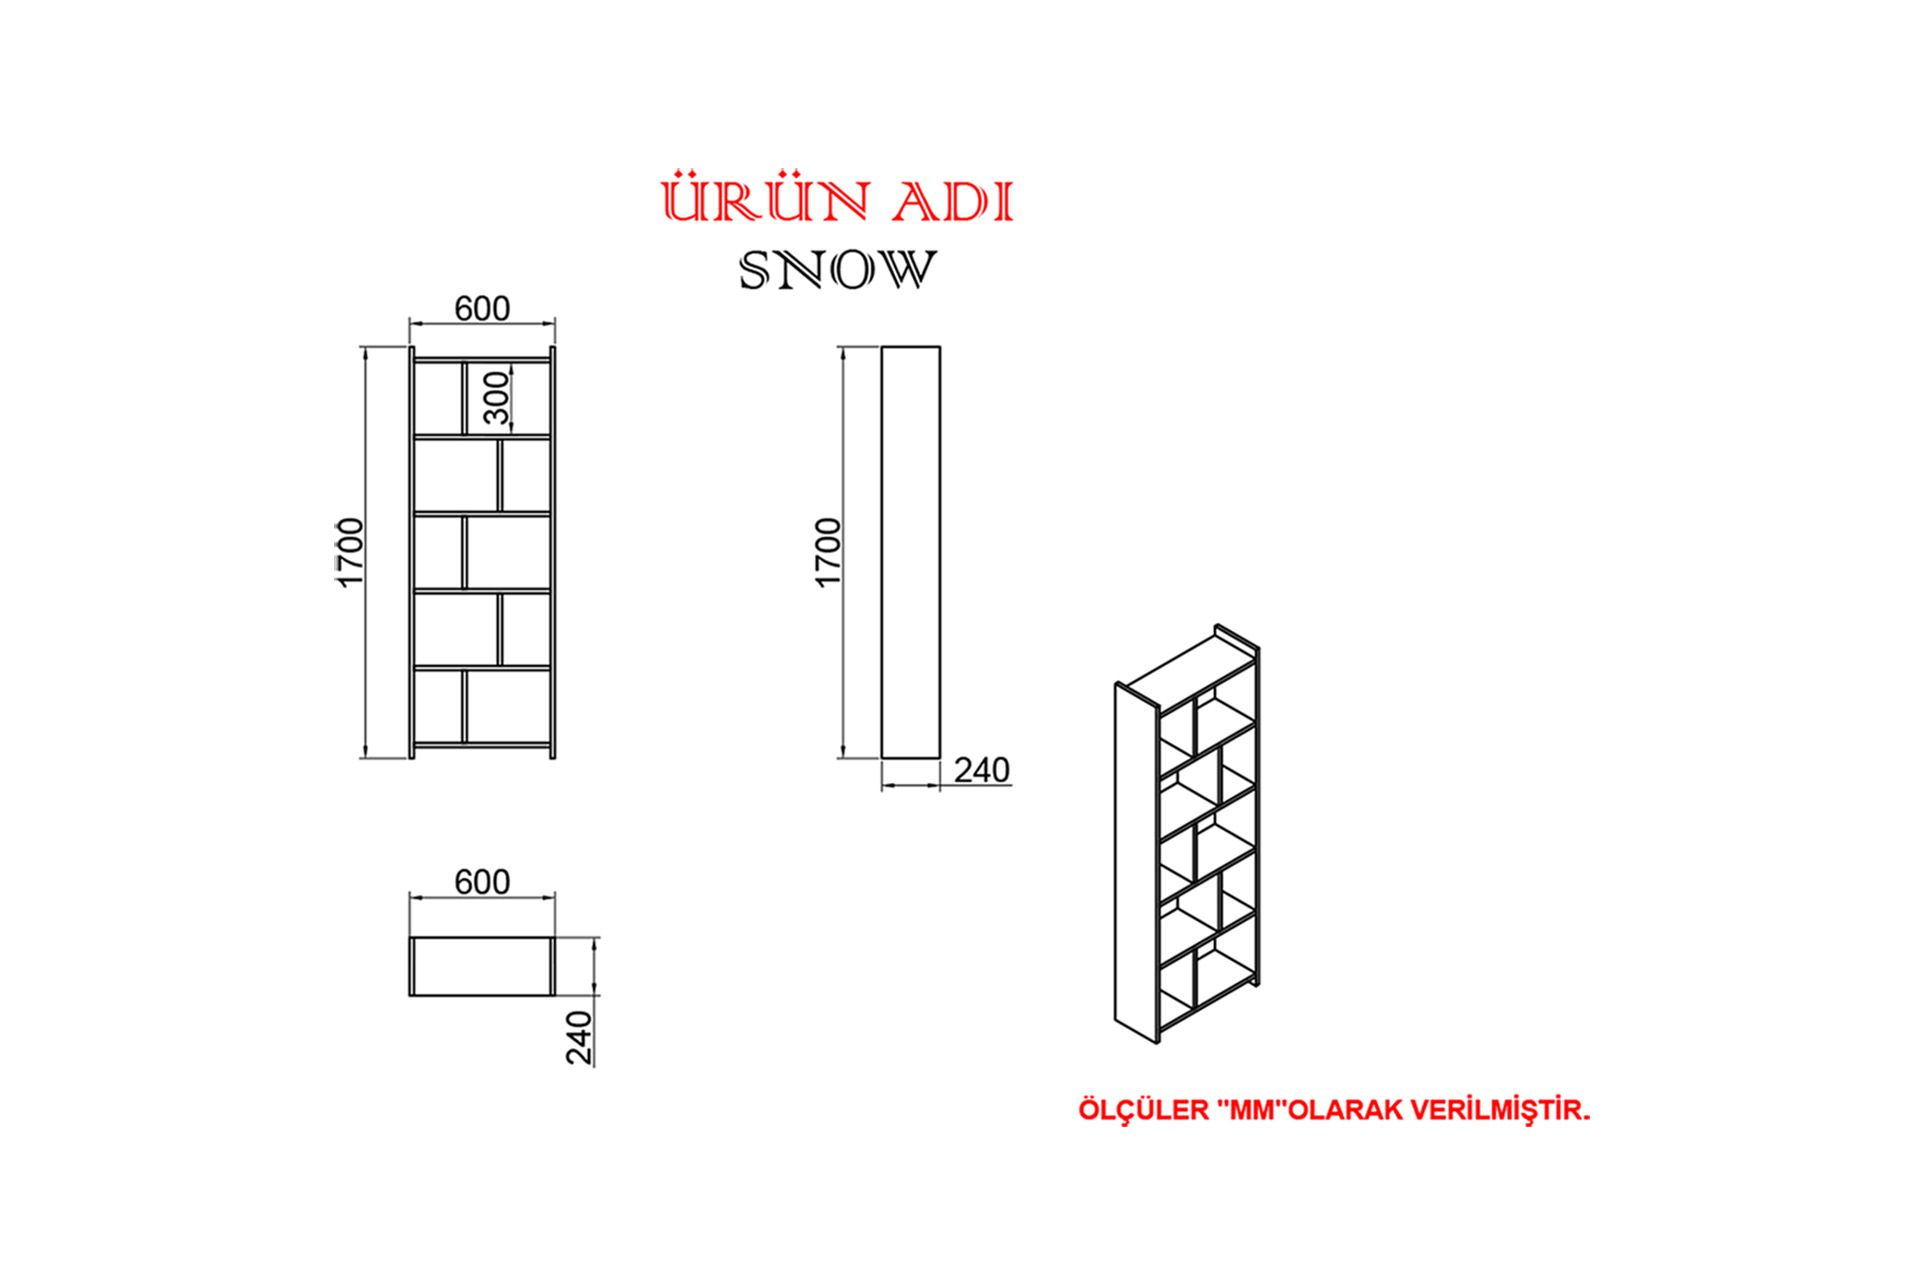 KALENDER DEKOR AVEL-TWİNS SNOW 145 CM ÇALIŞMA MASASI TAKIMI AVTS04